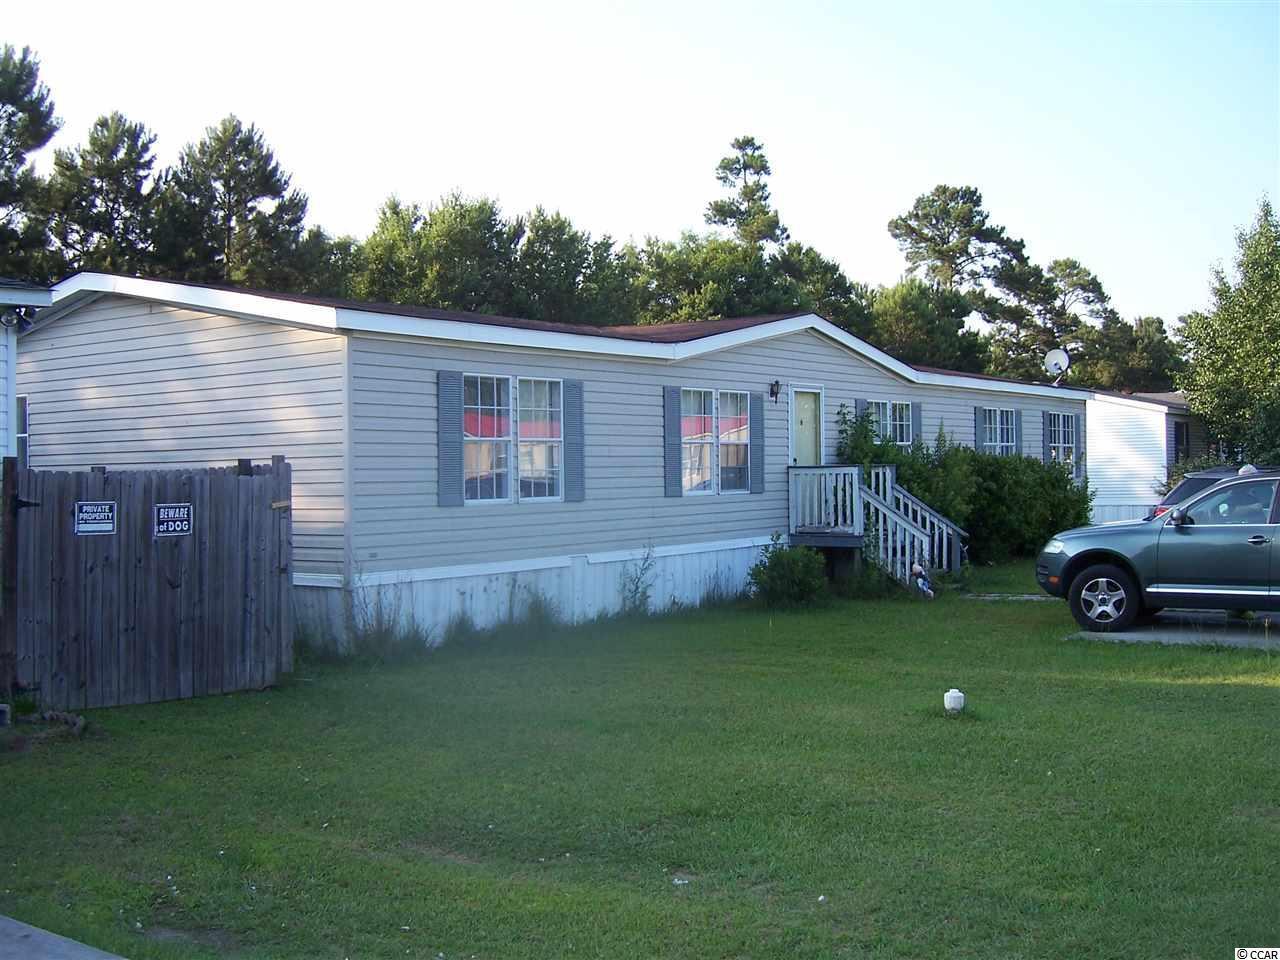 8194 Woodland Dr, Myrtle Beach, SC 29588 - Estimate and Home Details ...